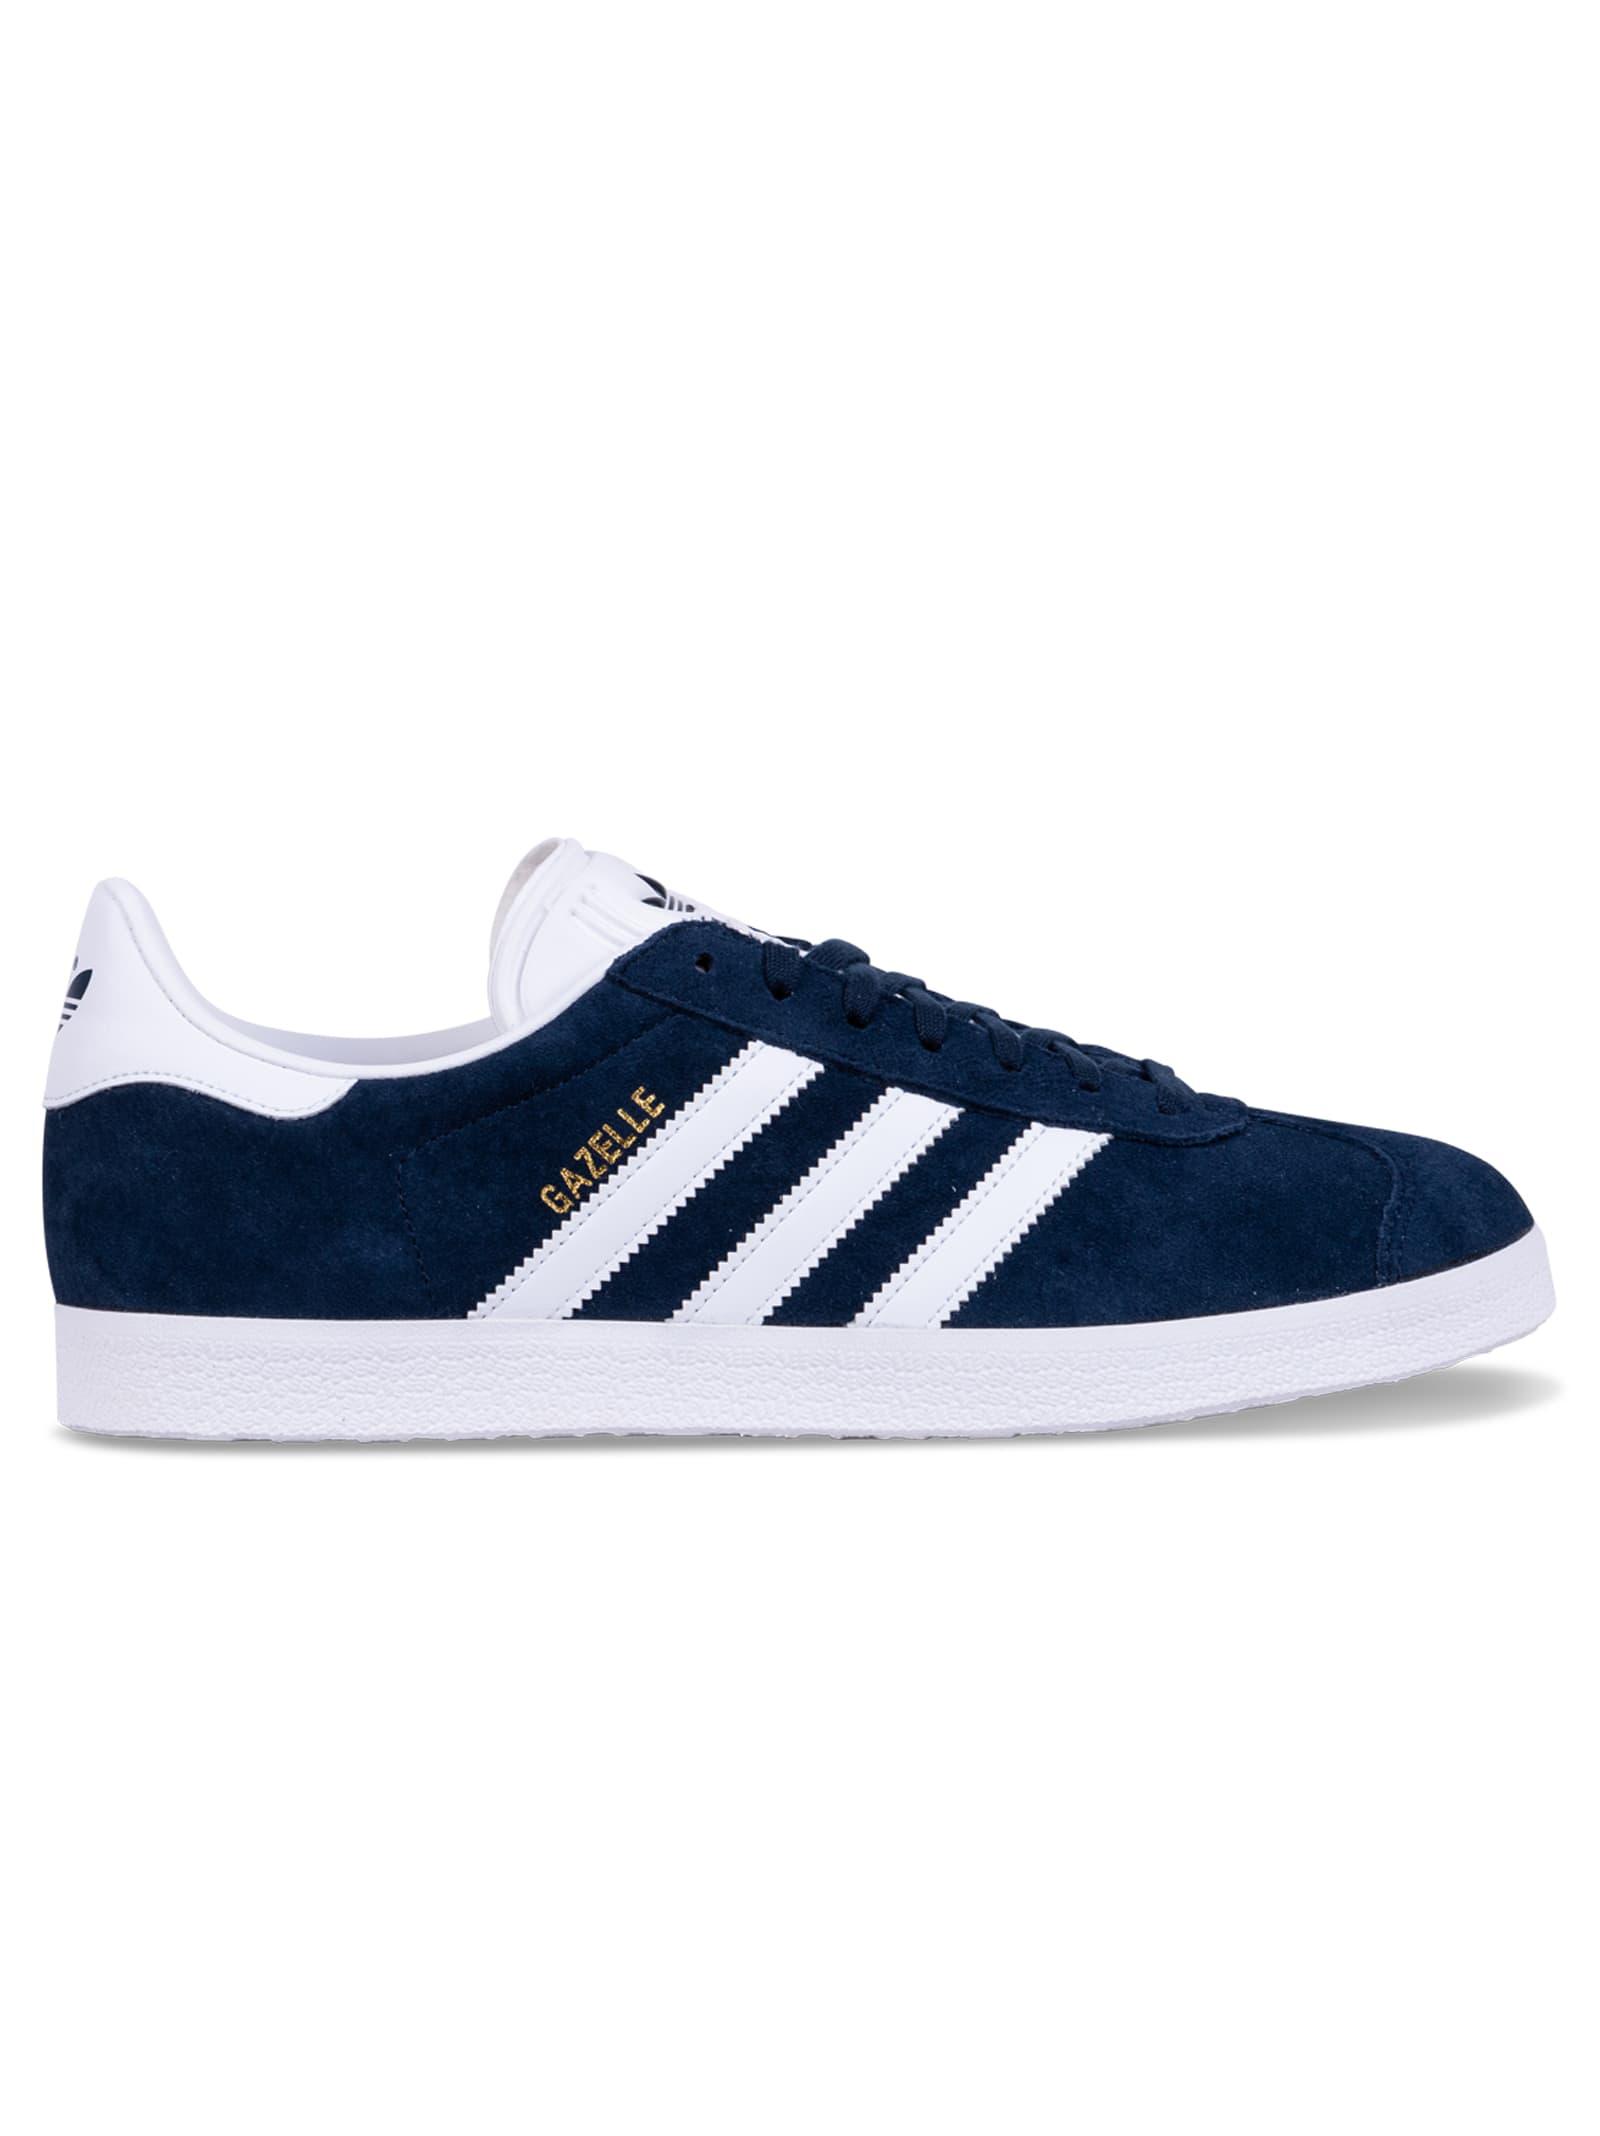 adidas gazelle bianche blu